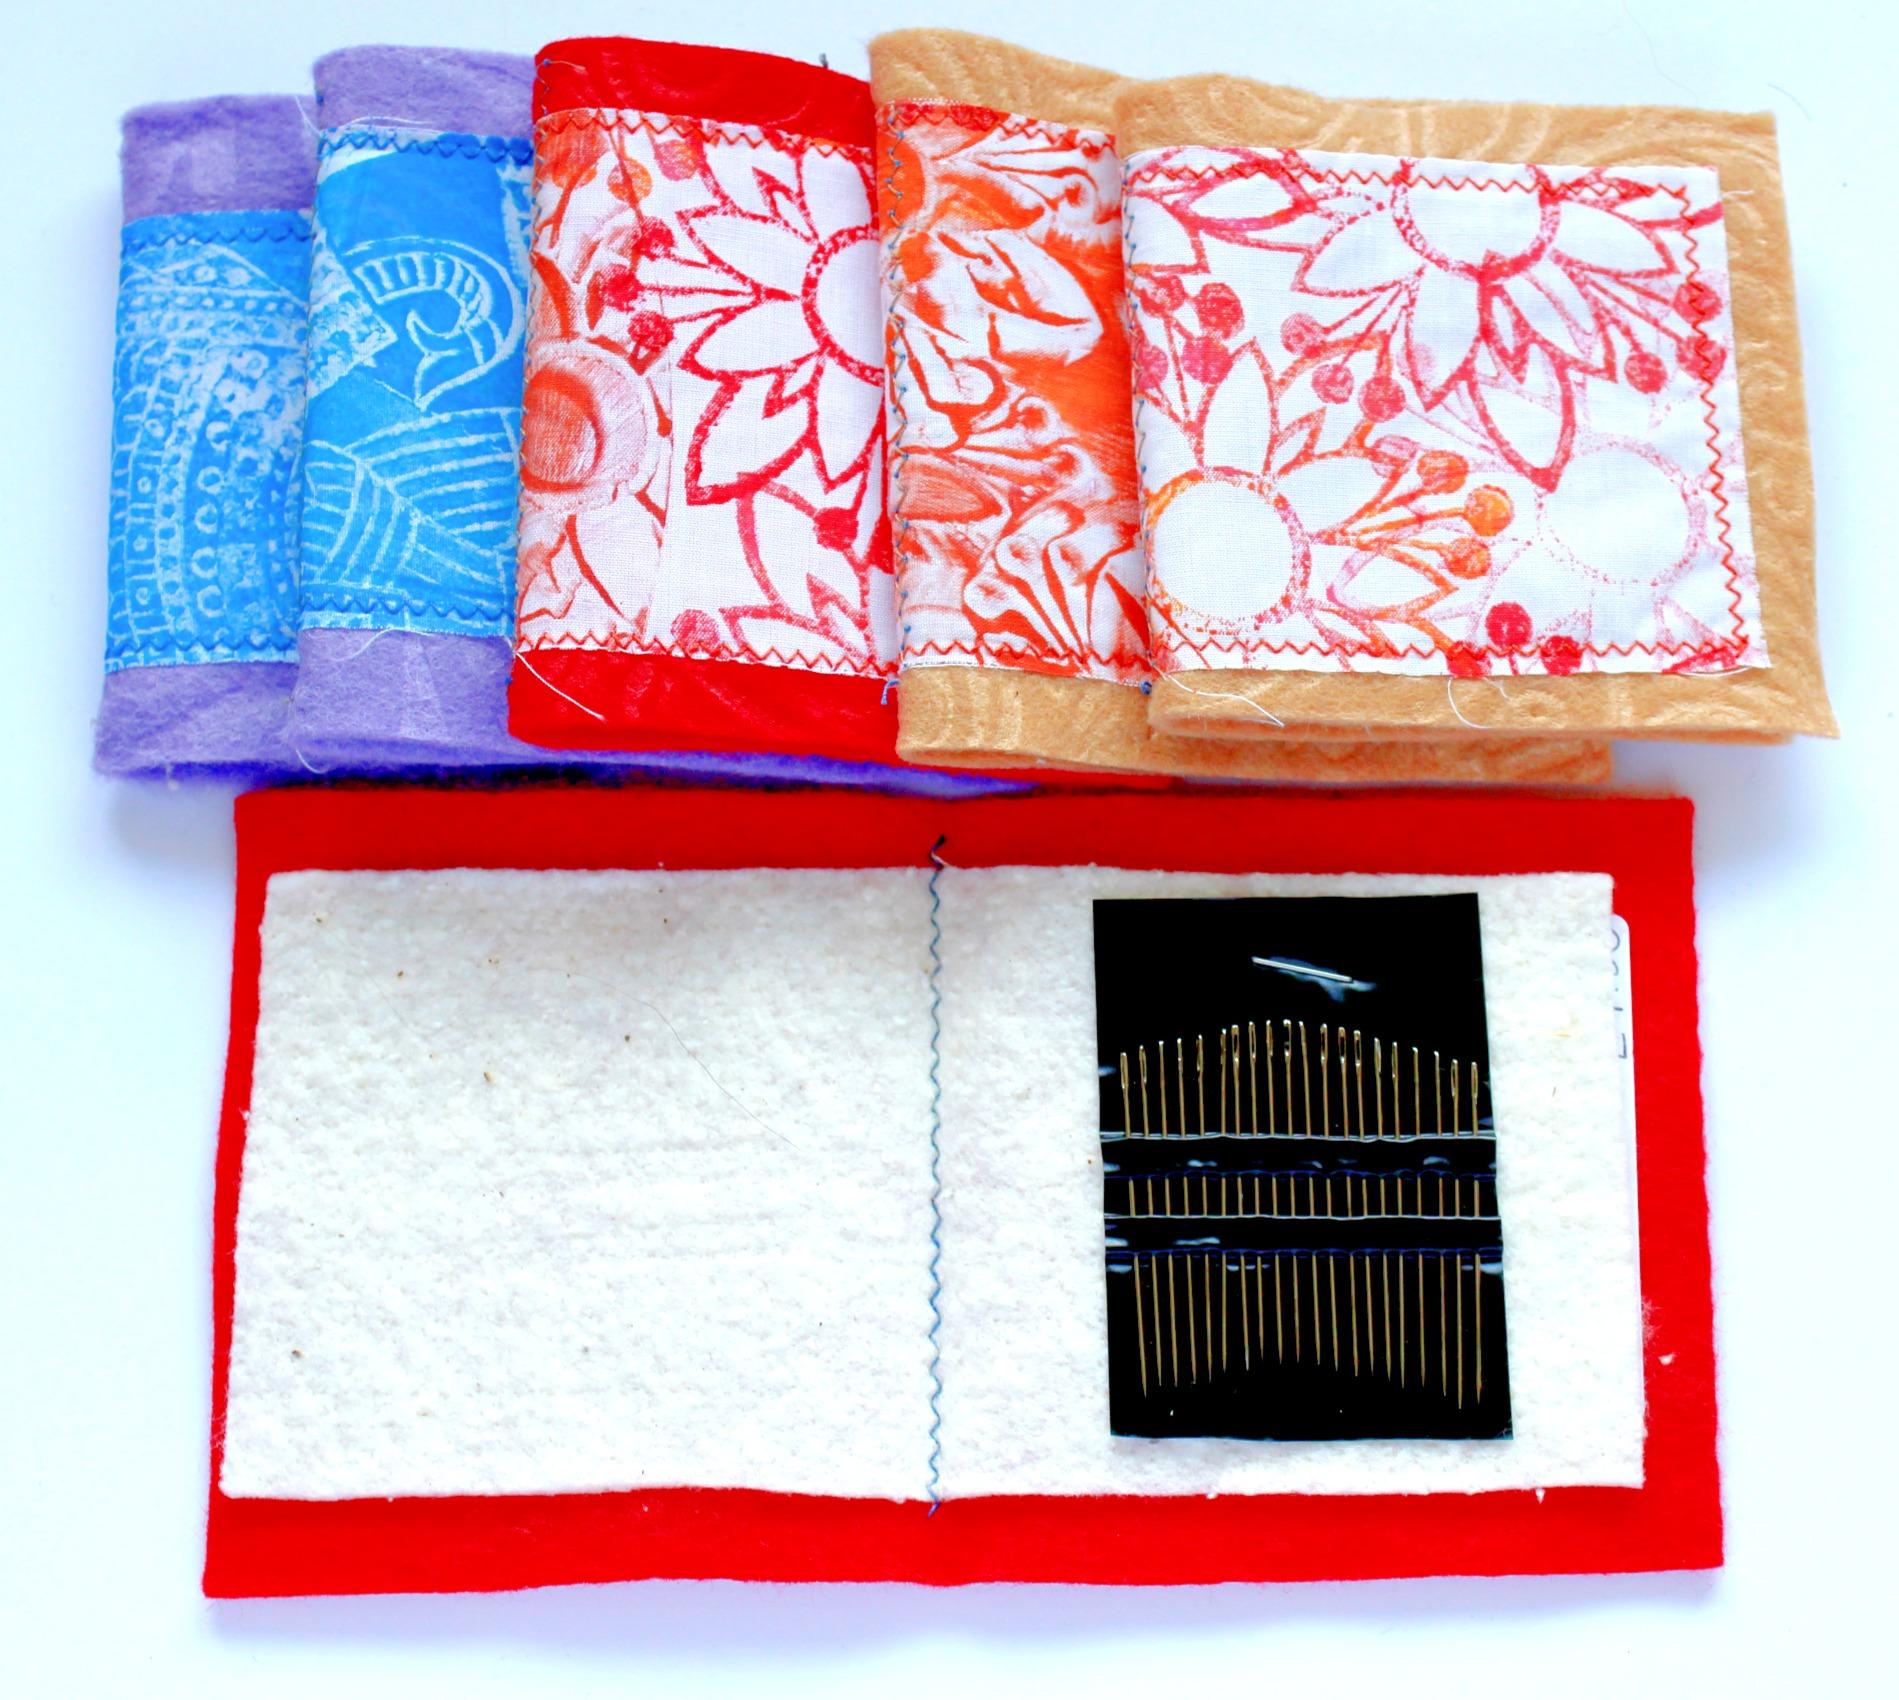 Needles in a case